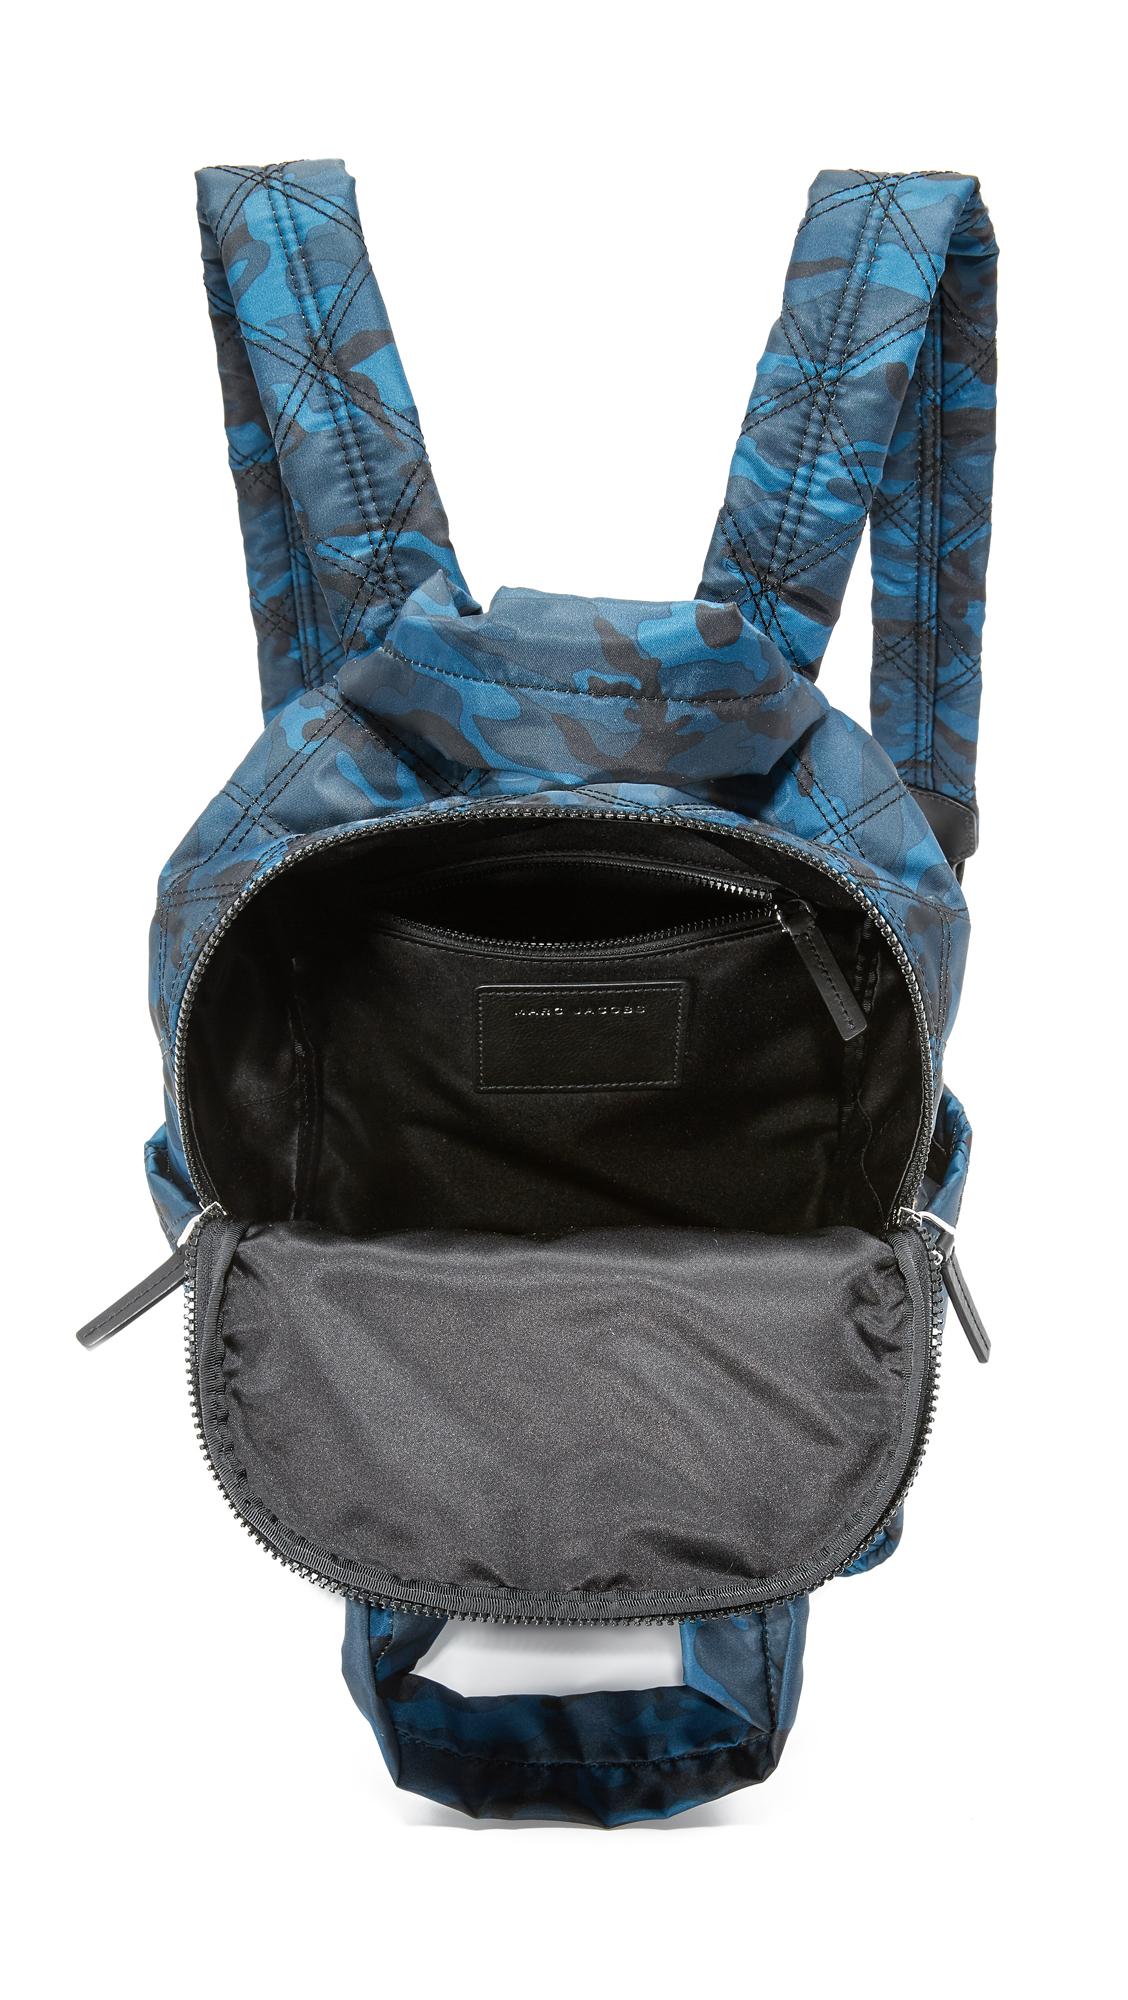 518c2575c223 Marc Jacobs Camo Nylon Knot Backpack